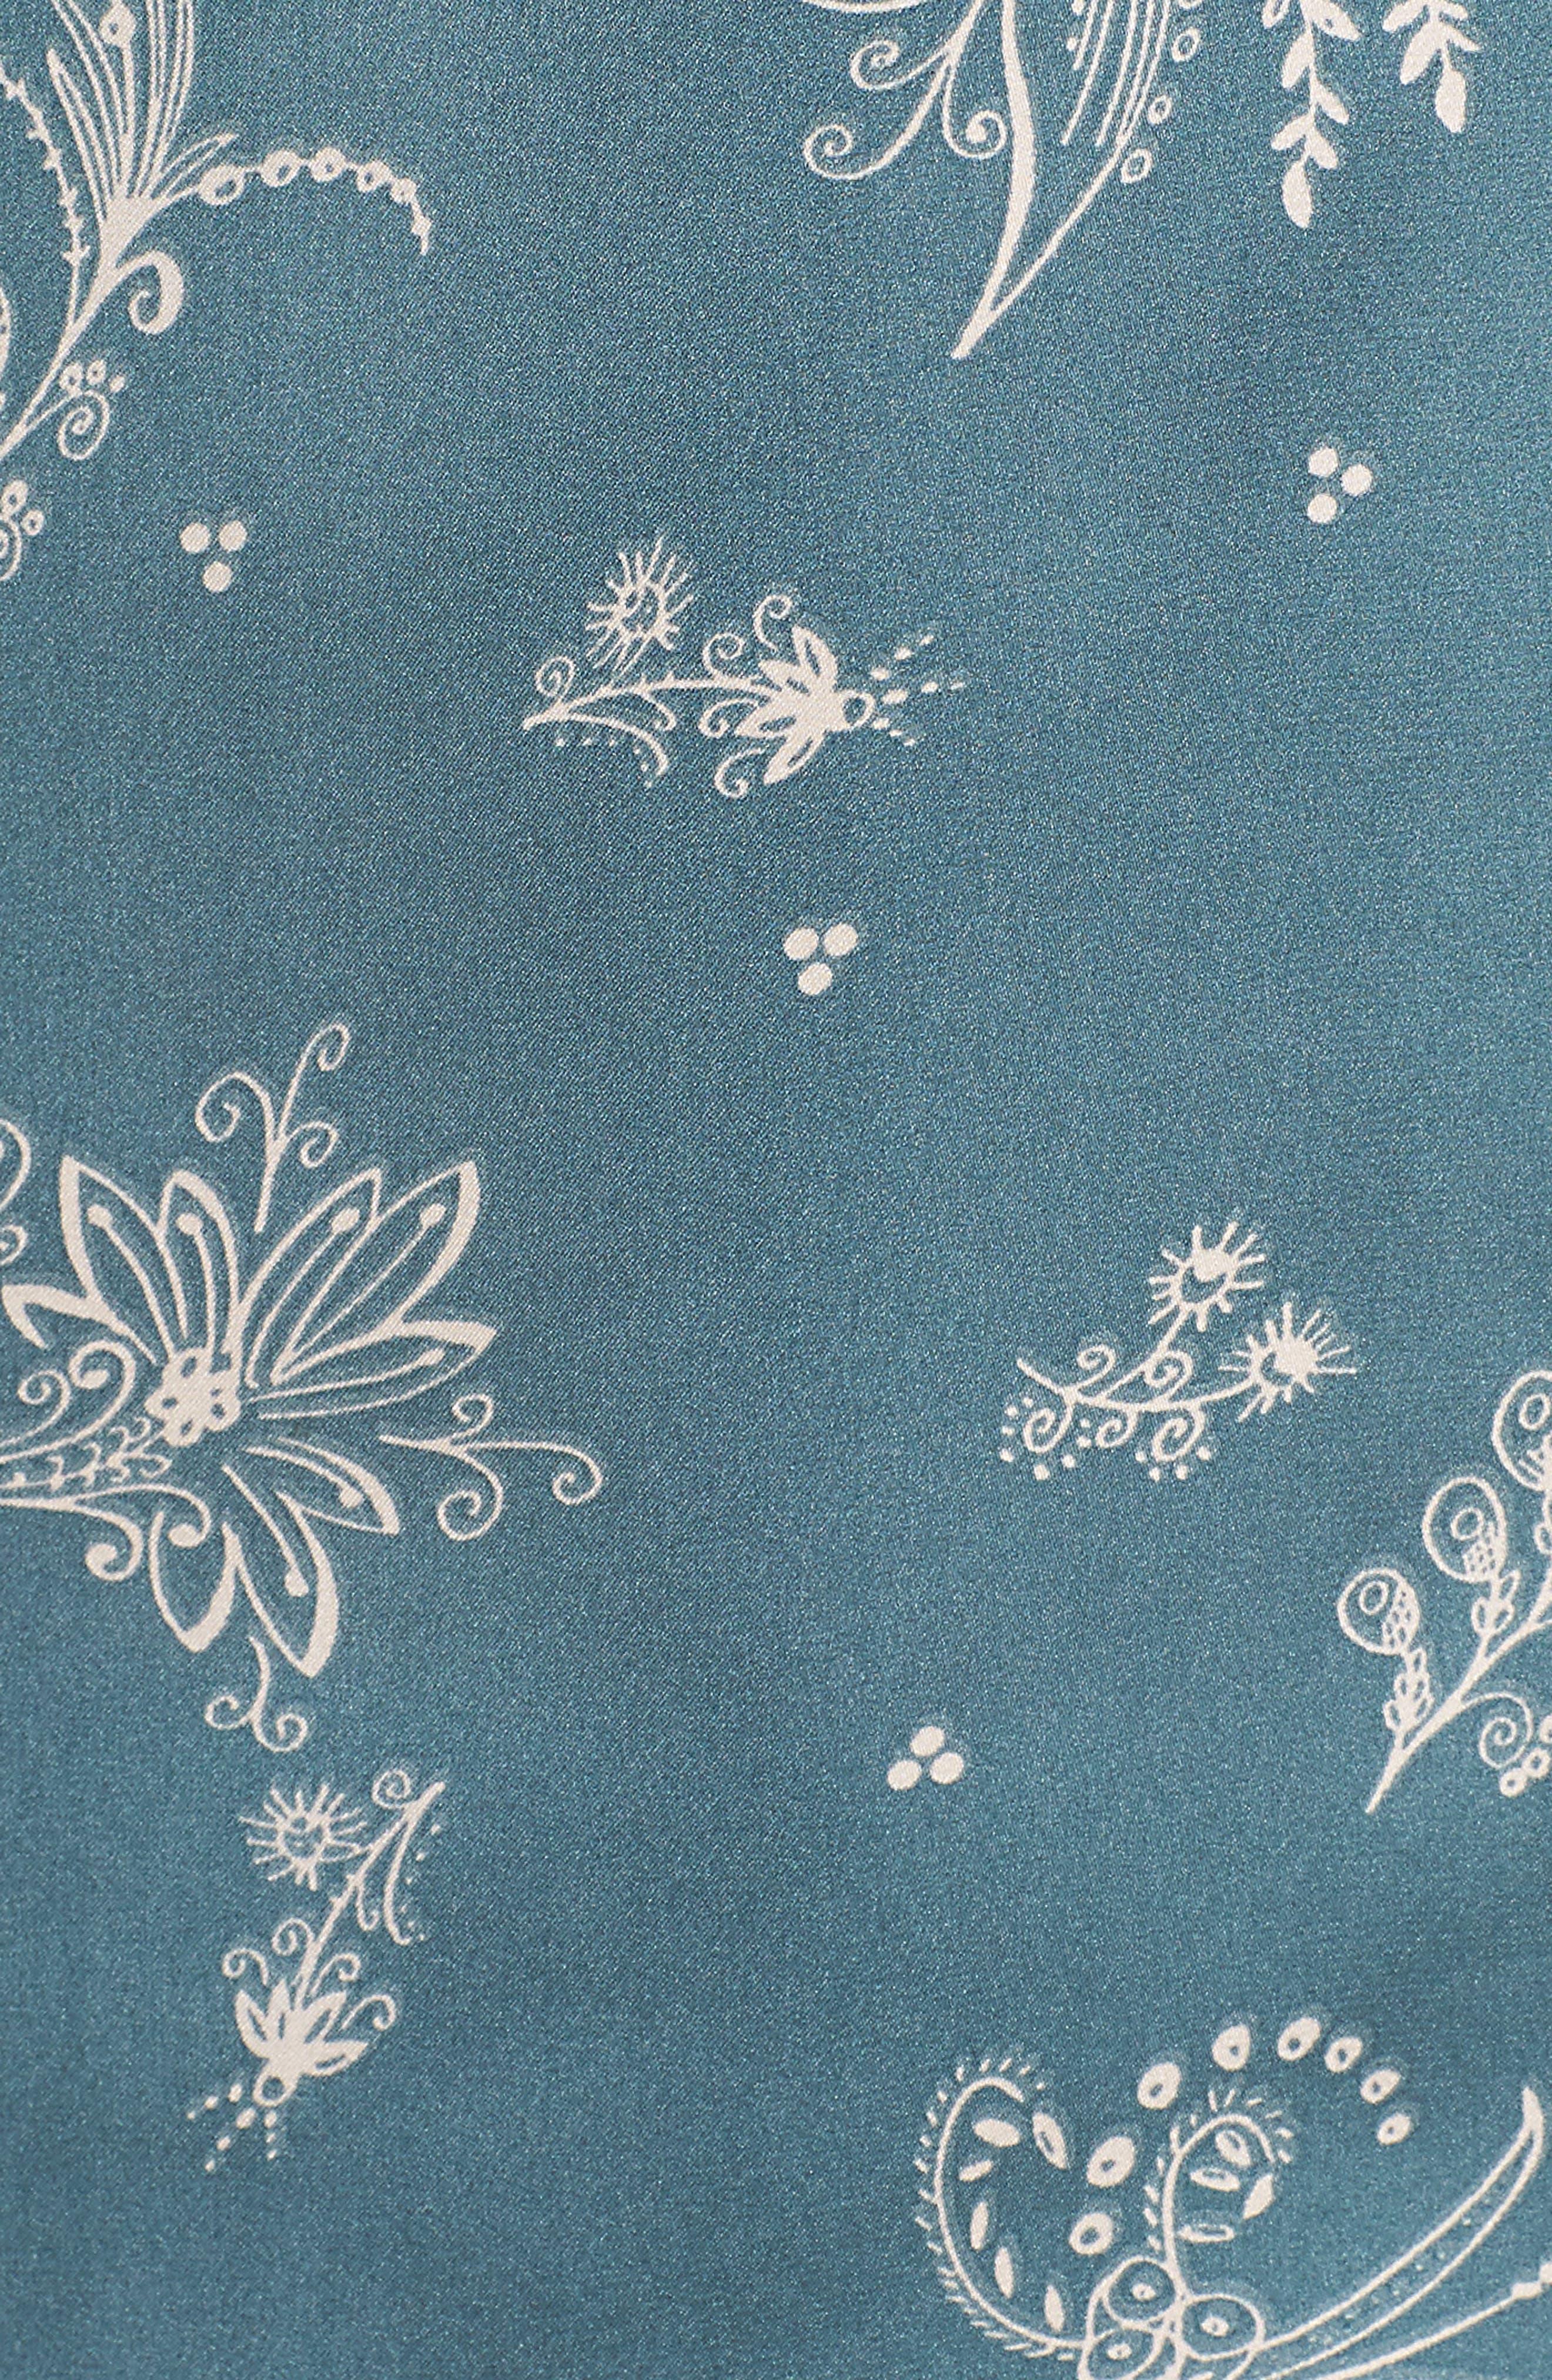 Satin Pajamas,                             Alternate thumbnail 5, color,                             BLUE GOBLIN FLIRTY FLORAL